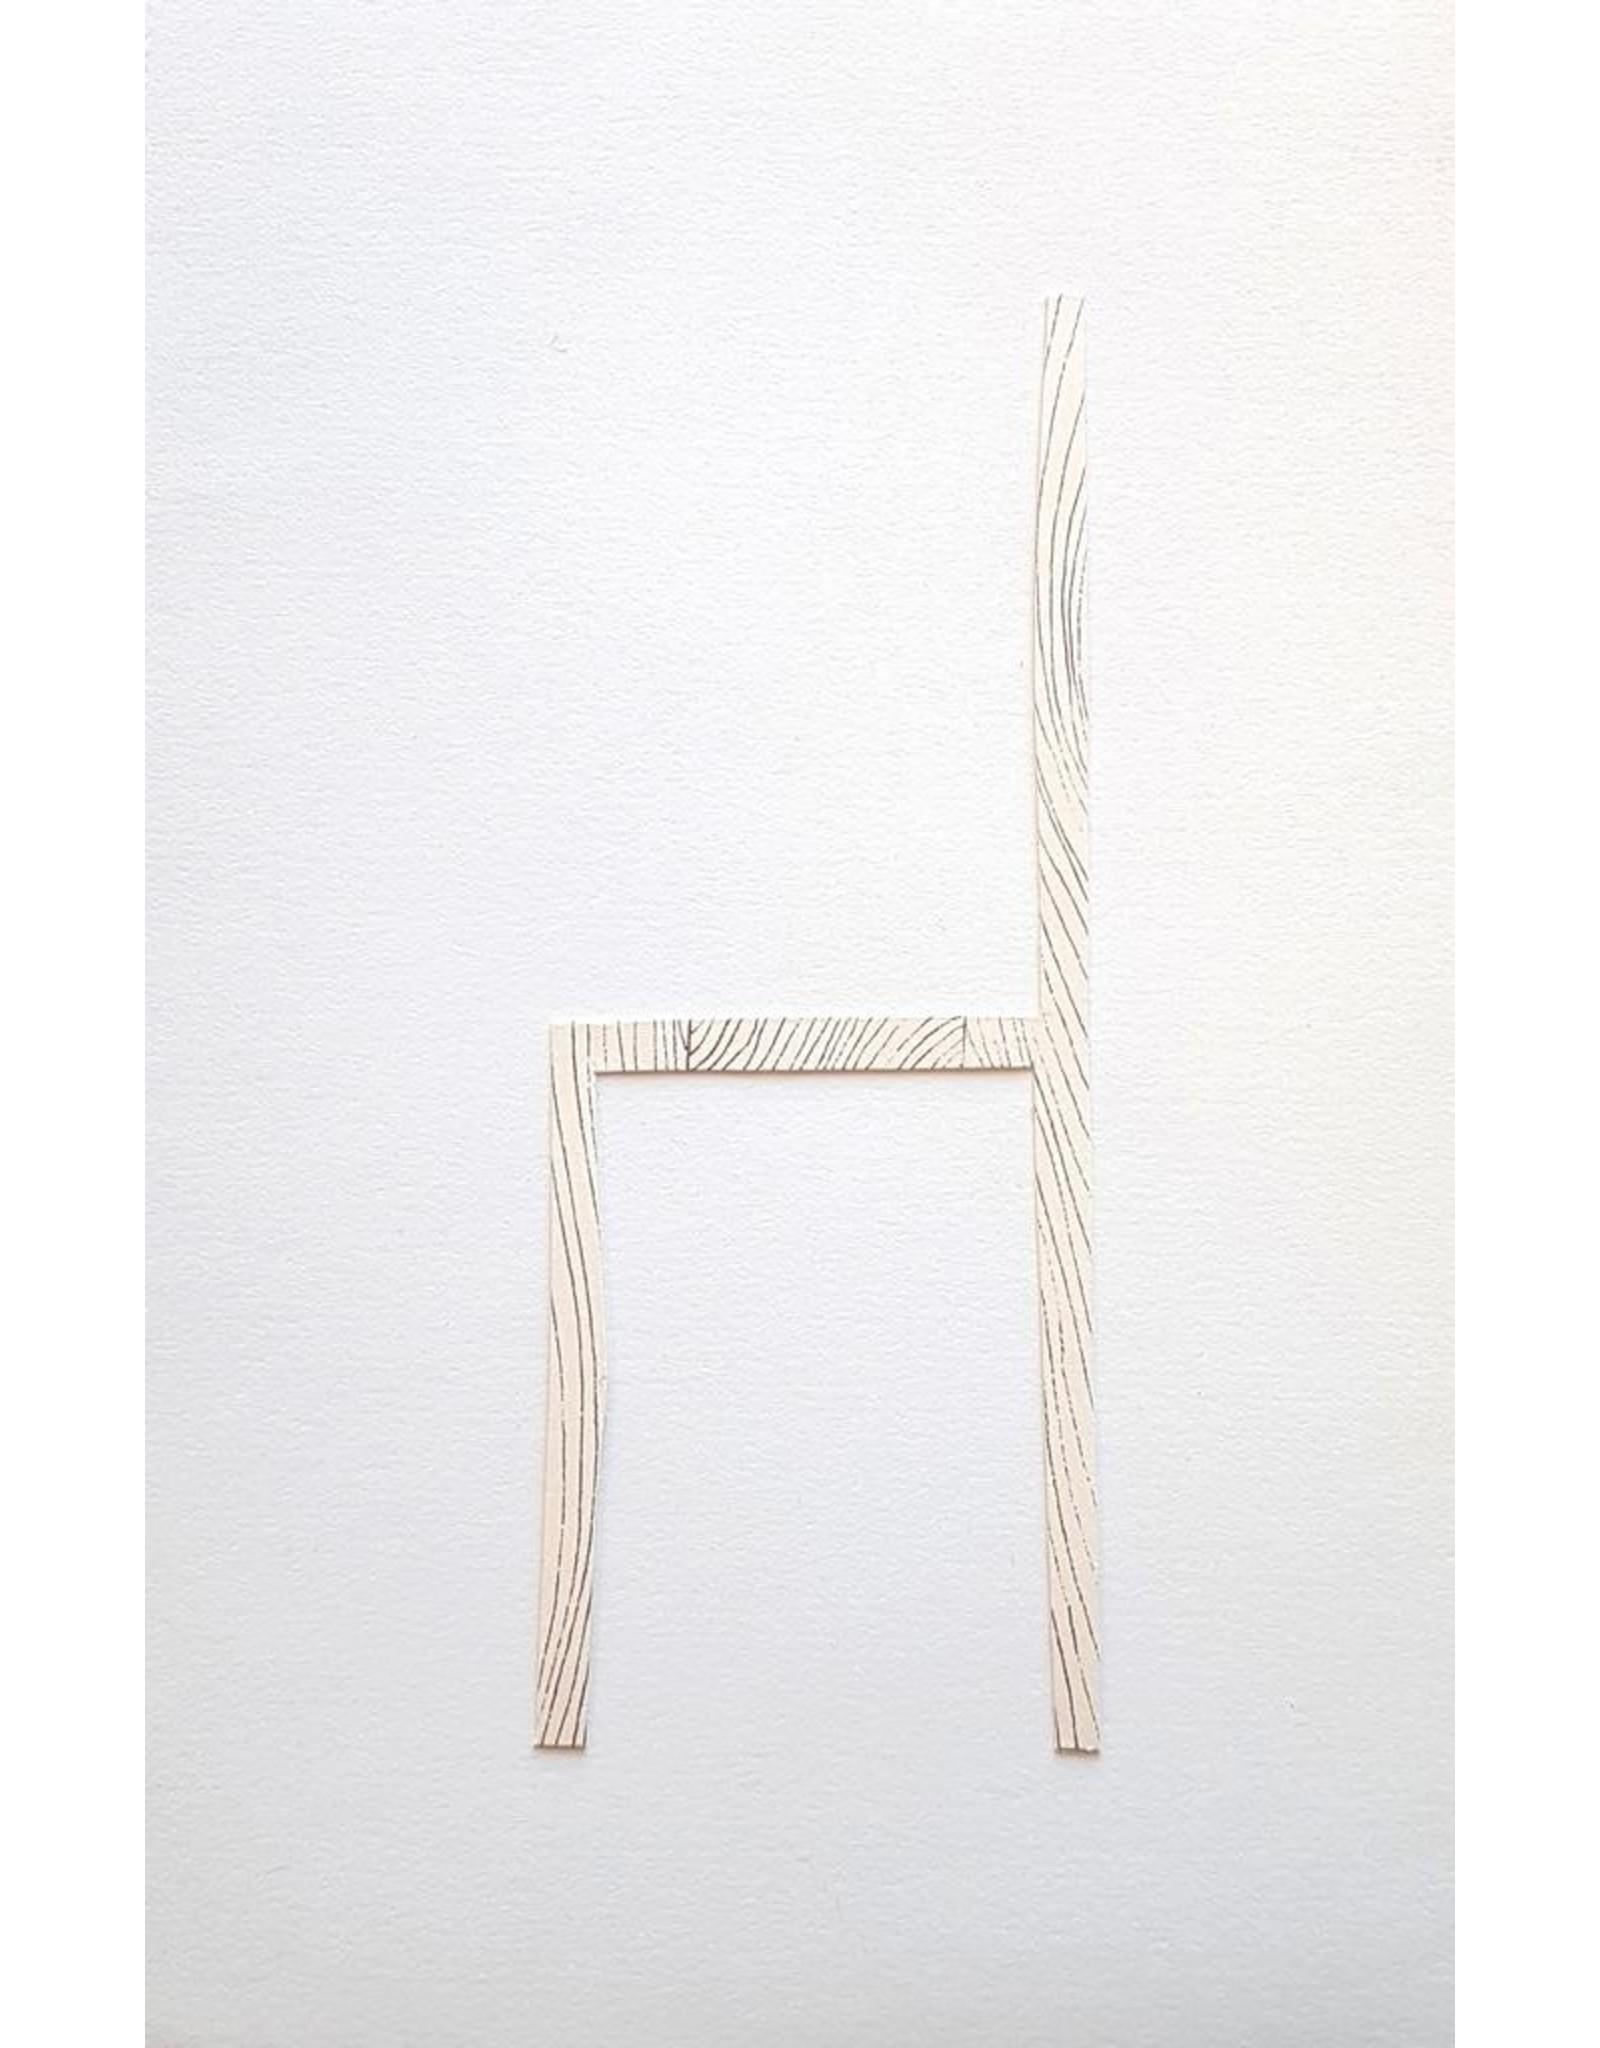 Josephson-Laidlaw, Erin Chair, screen print and collage by Erin Josephson-Laidlaw